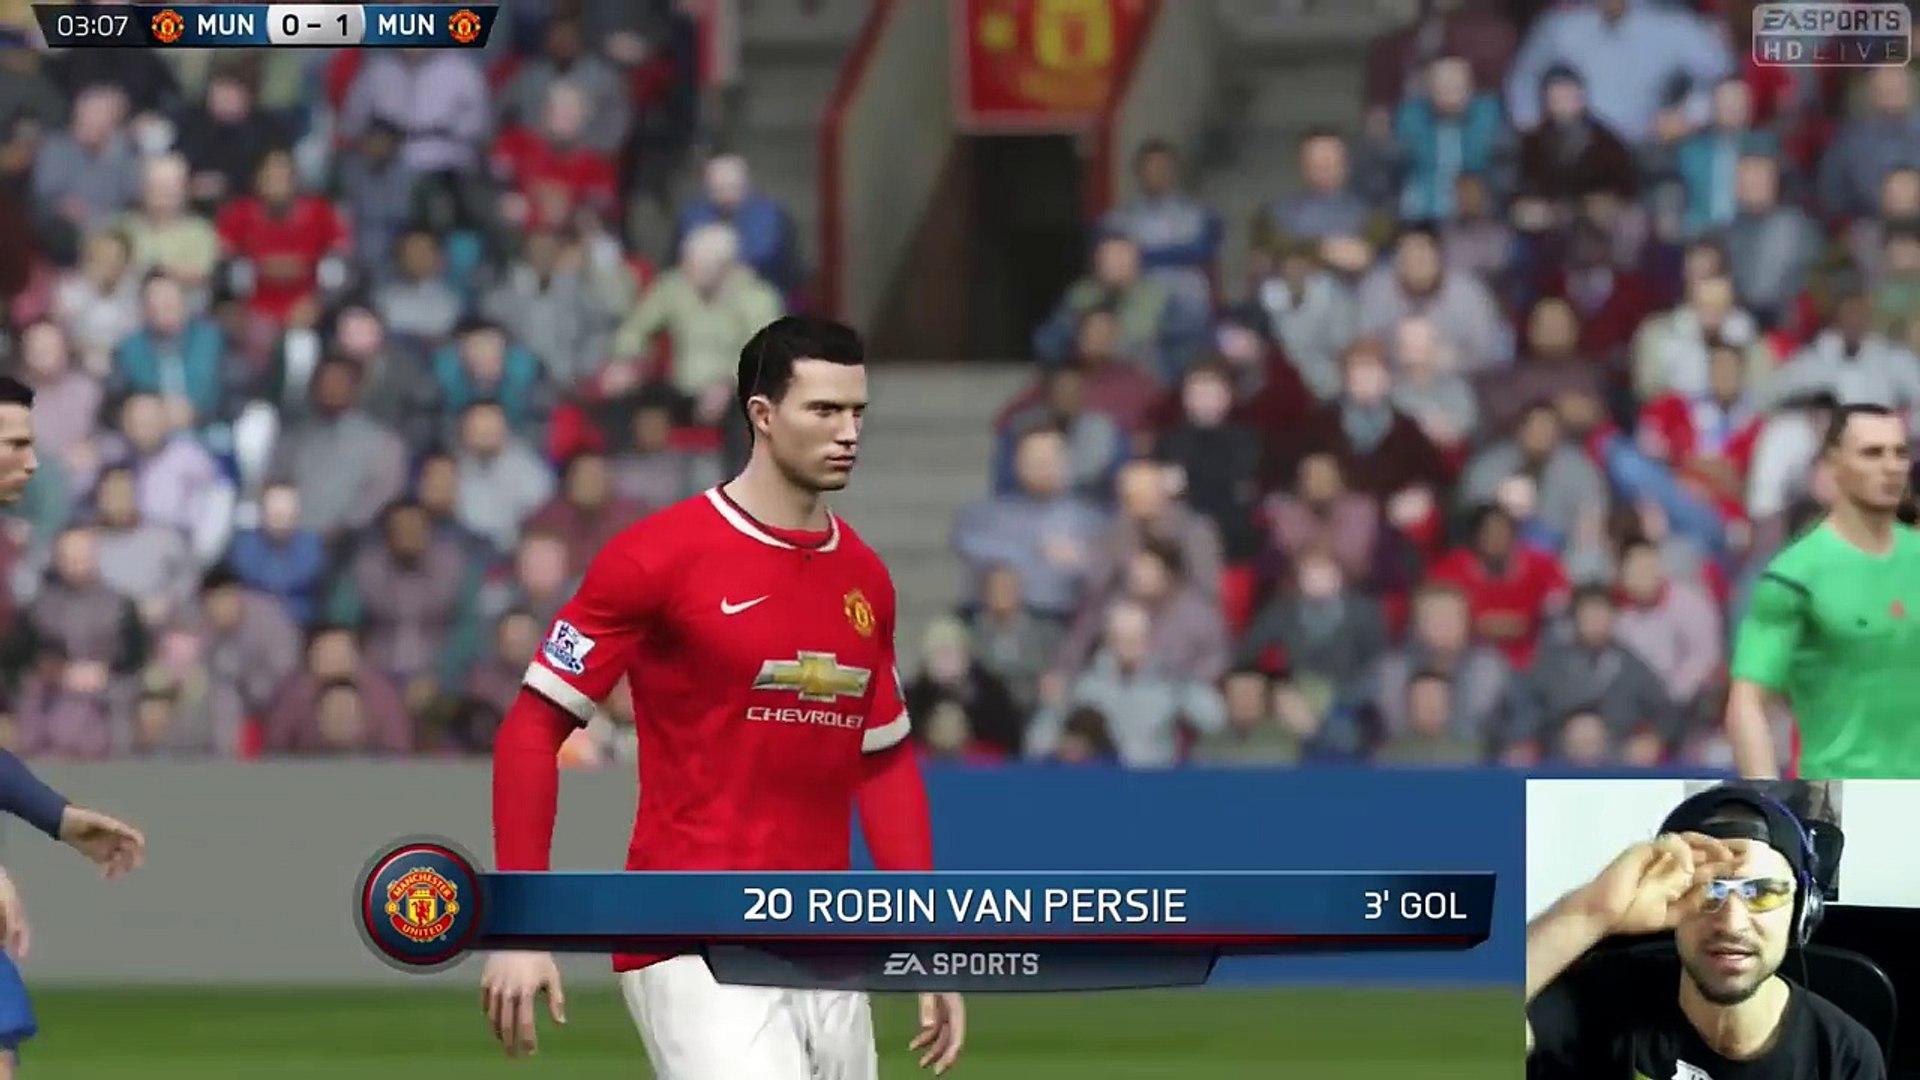 FIFA 15 ONLINE - Manchester United VS Manchester United - Partido de Temporada - PS4 Gameplay